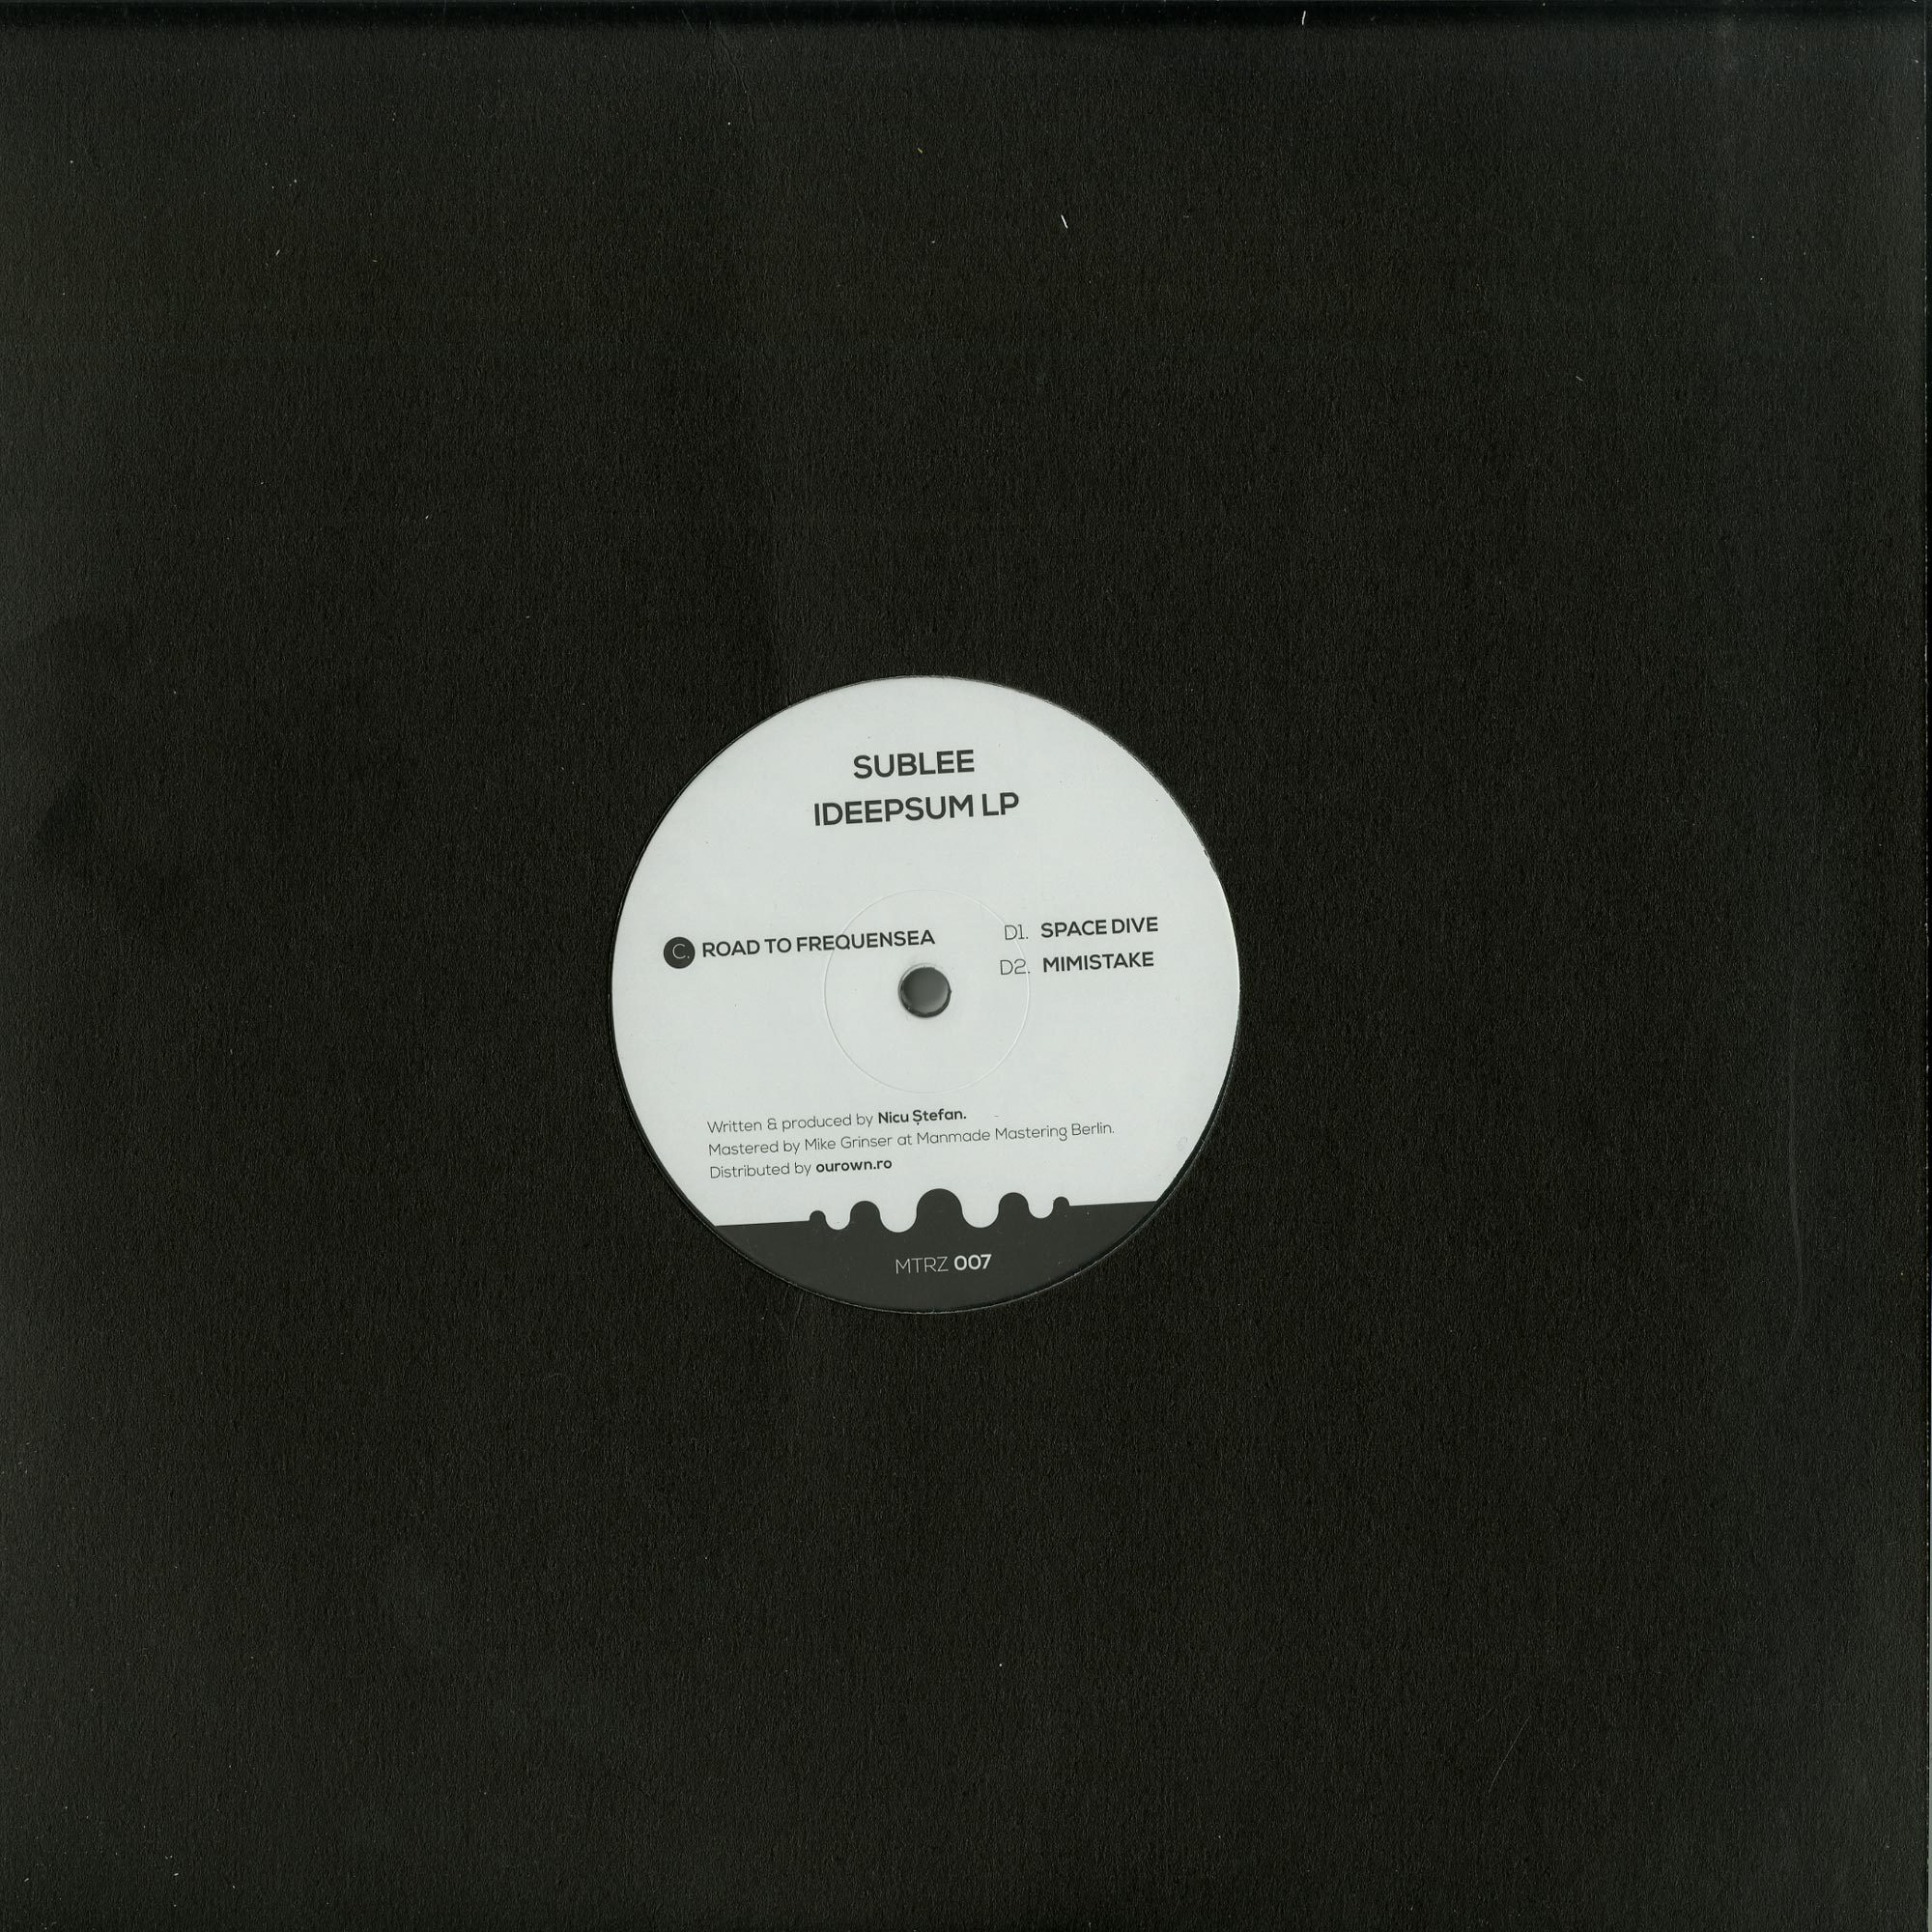 Sublee - IDEEPSUM LP